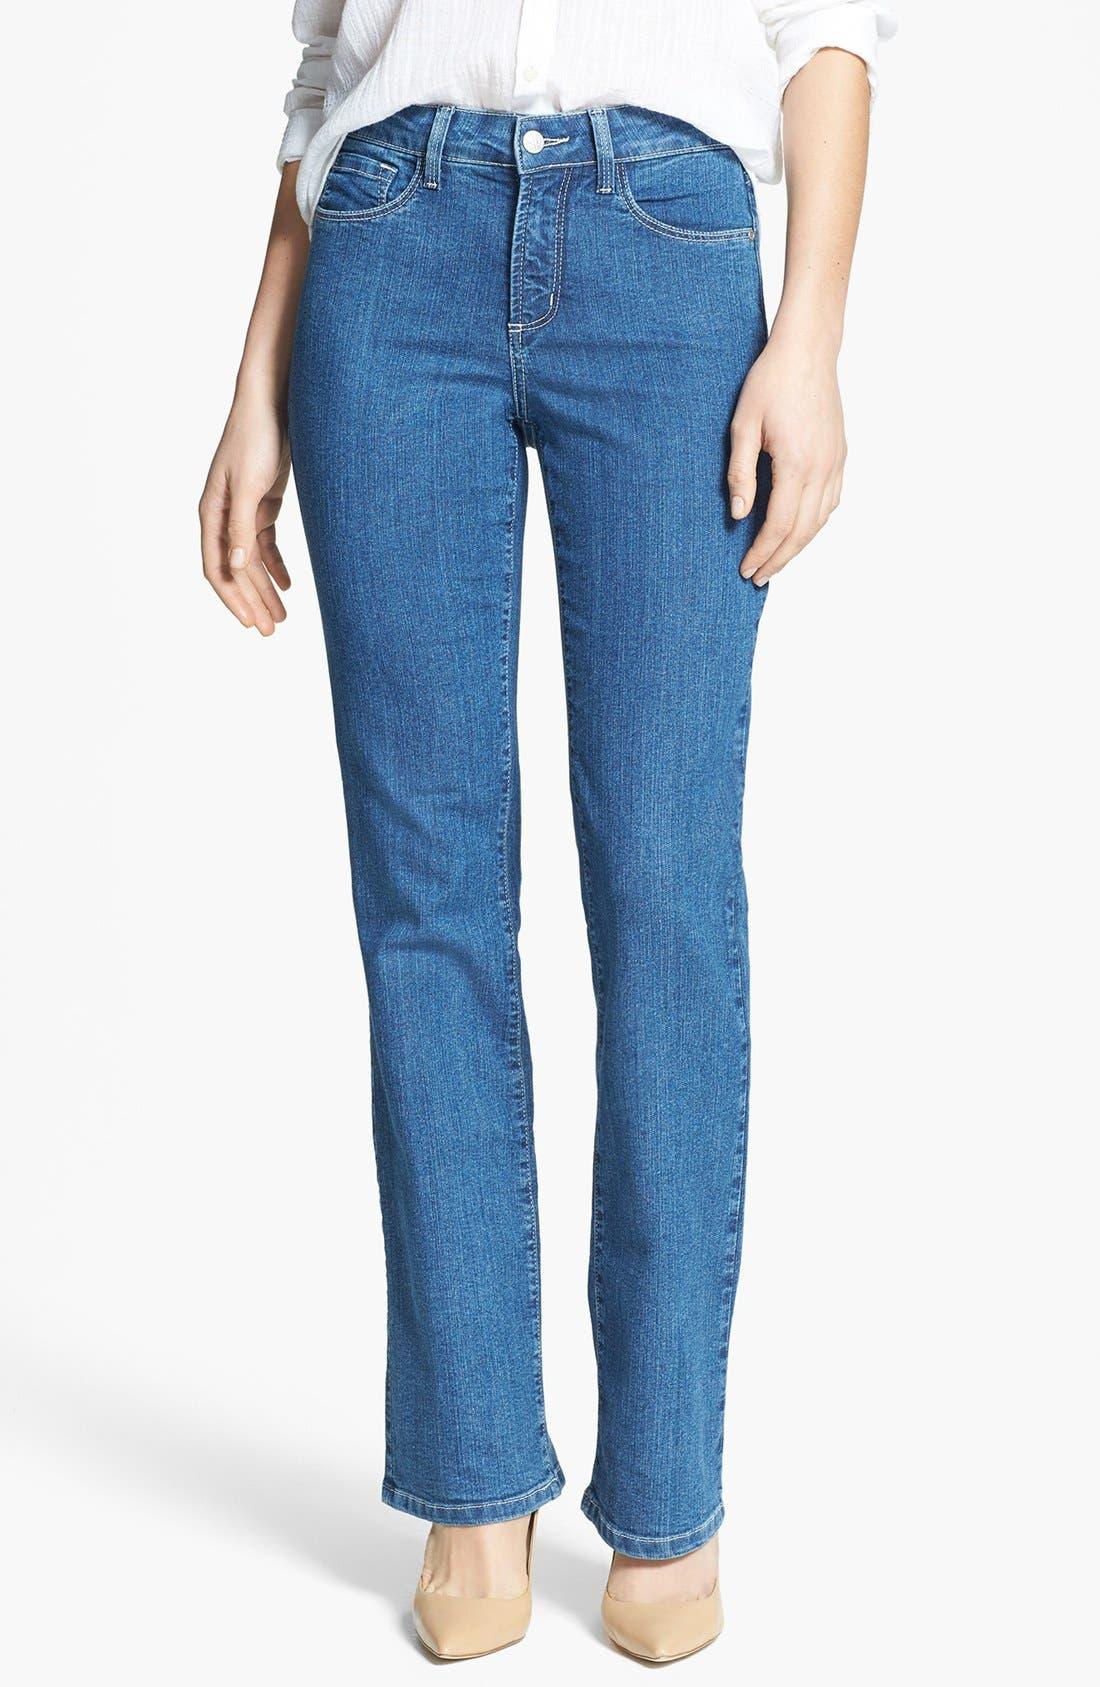 Alternate Image 1 Selected - NYDJ 'Barbara' Embellished Pocket Stretch Bootcut Jeans (Maryland)